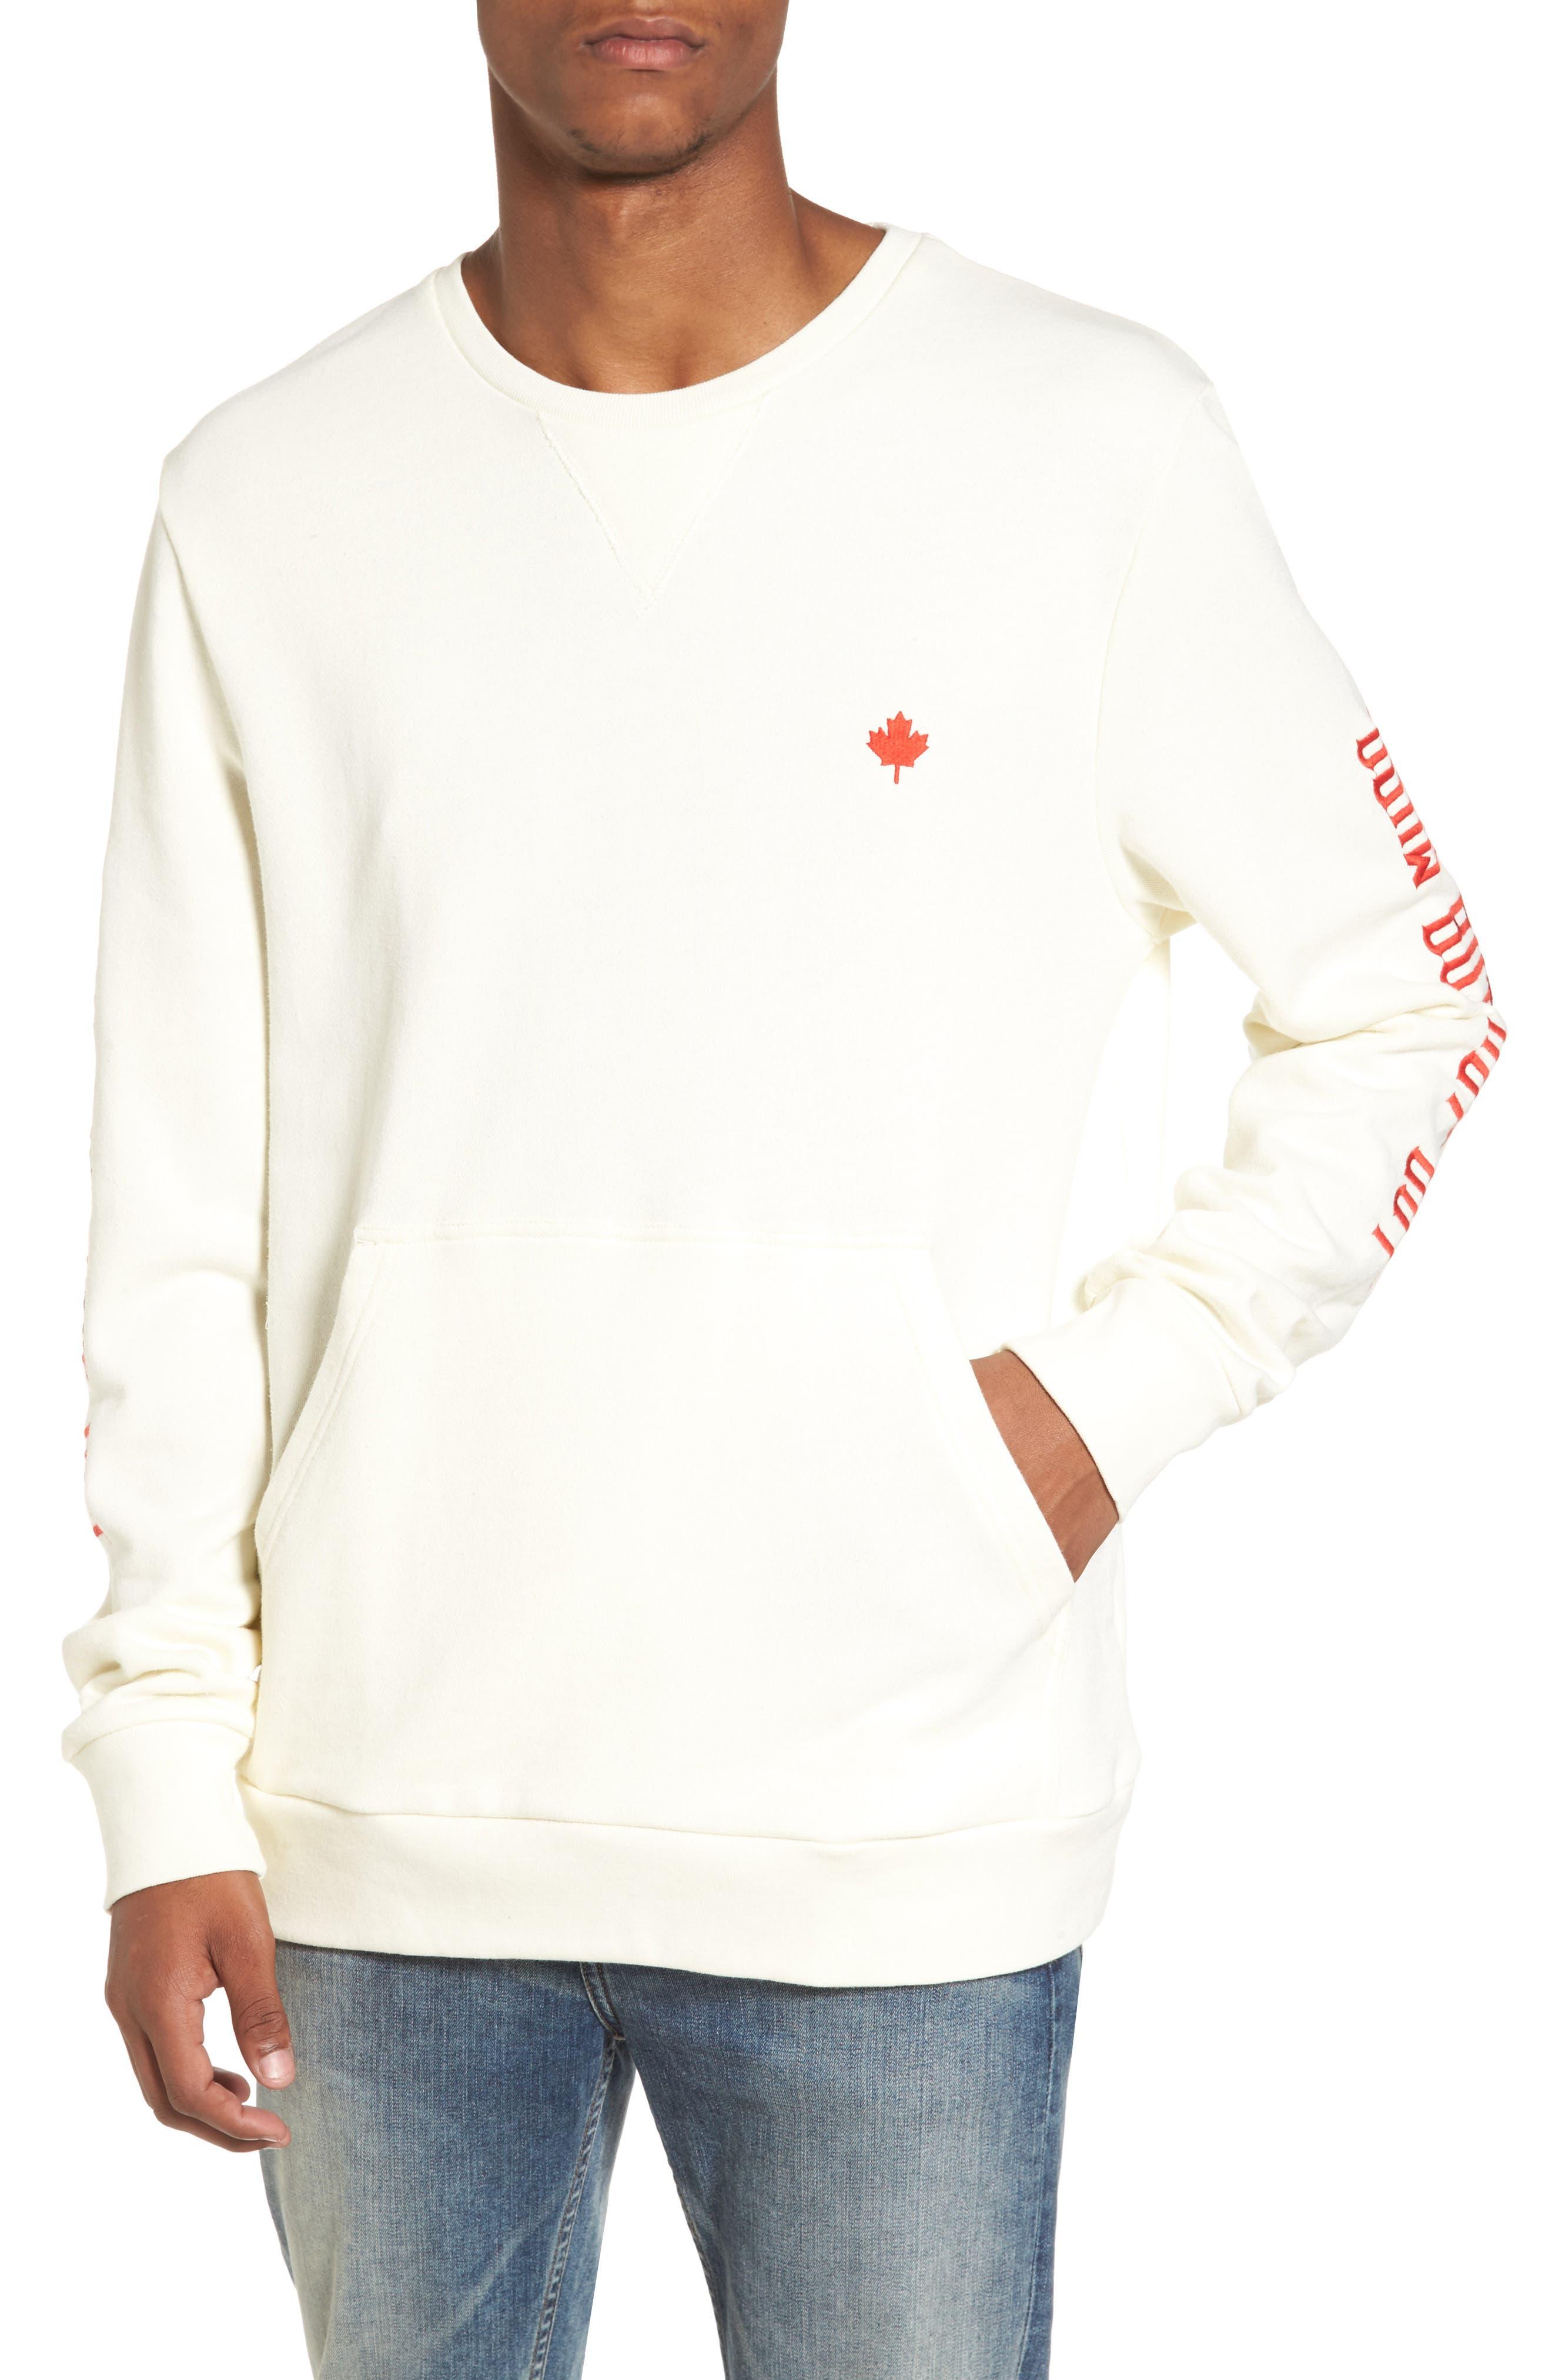 Up North Fleece Sweatshirt,                         Main,                         color, Bone